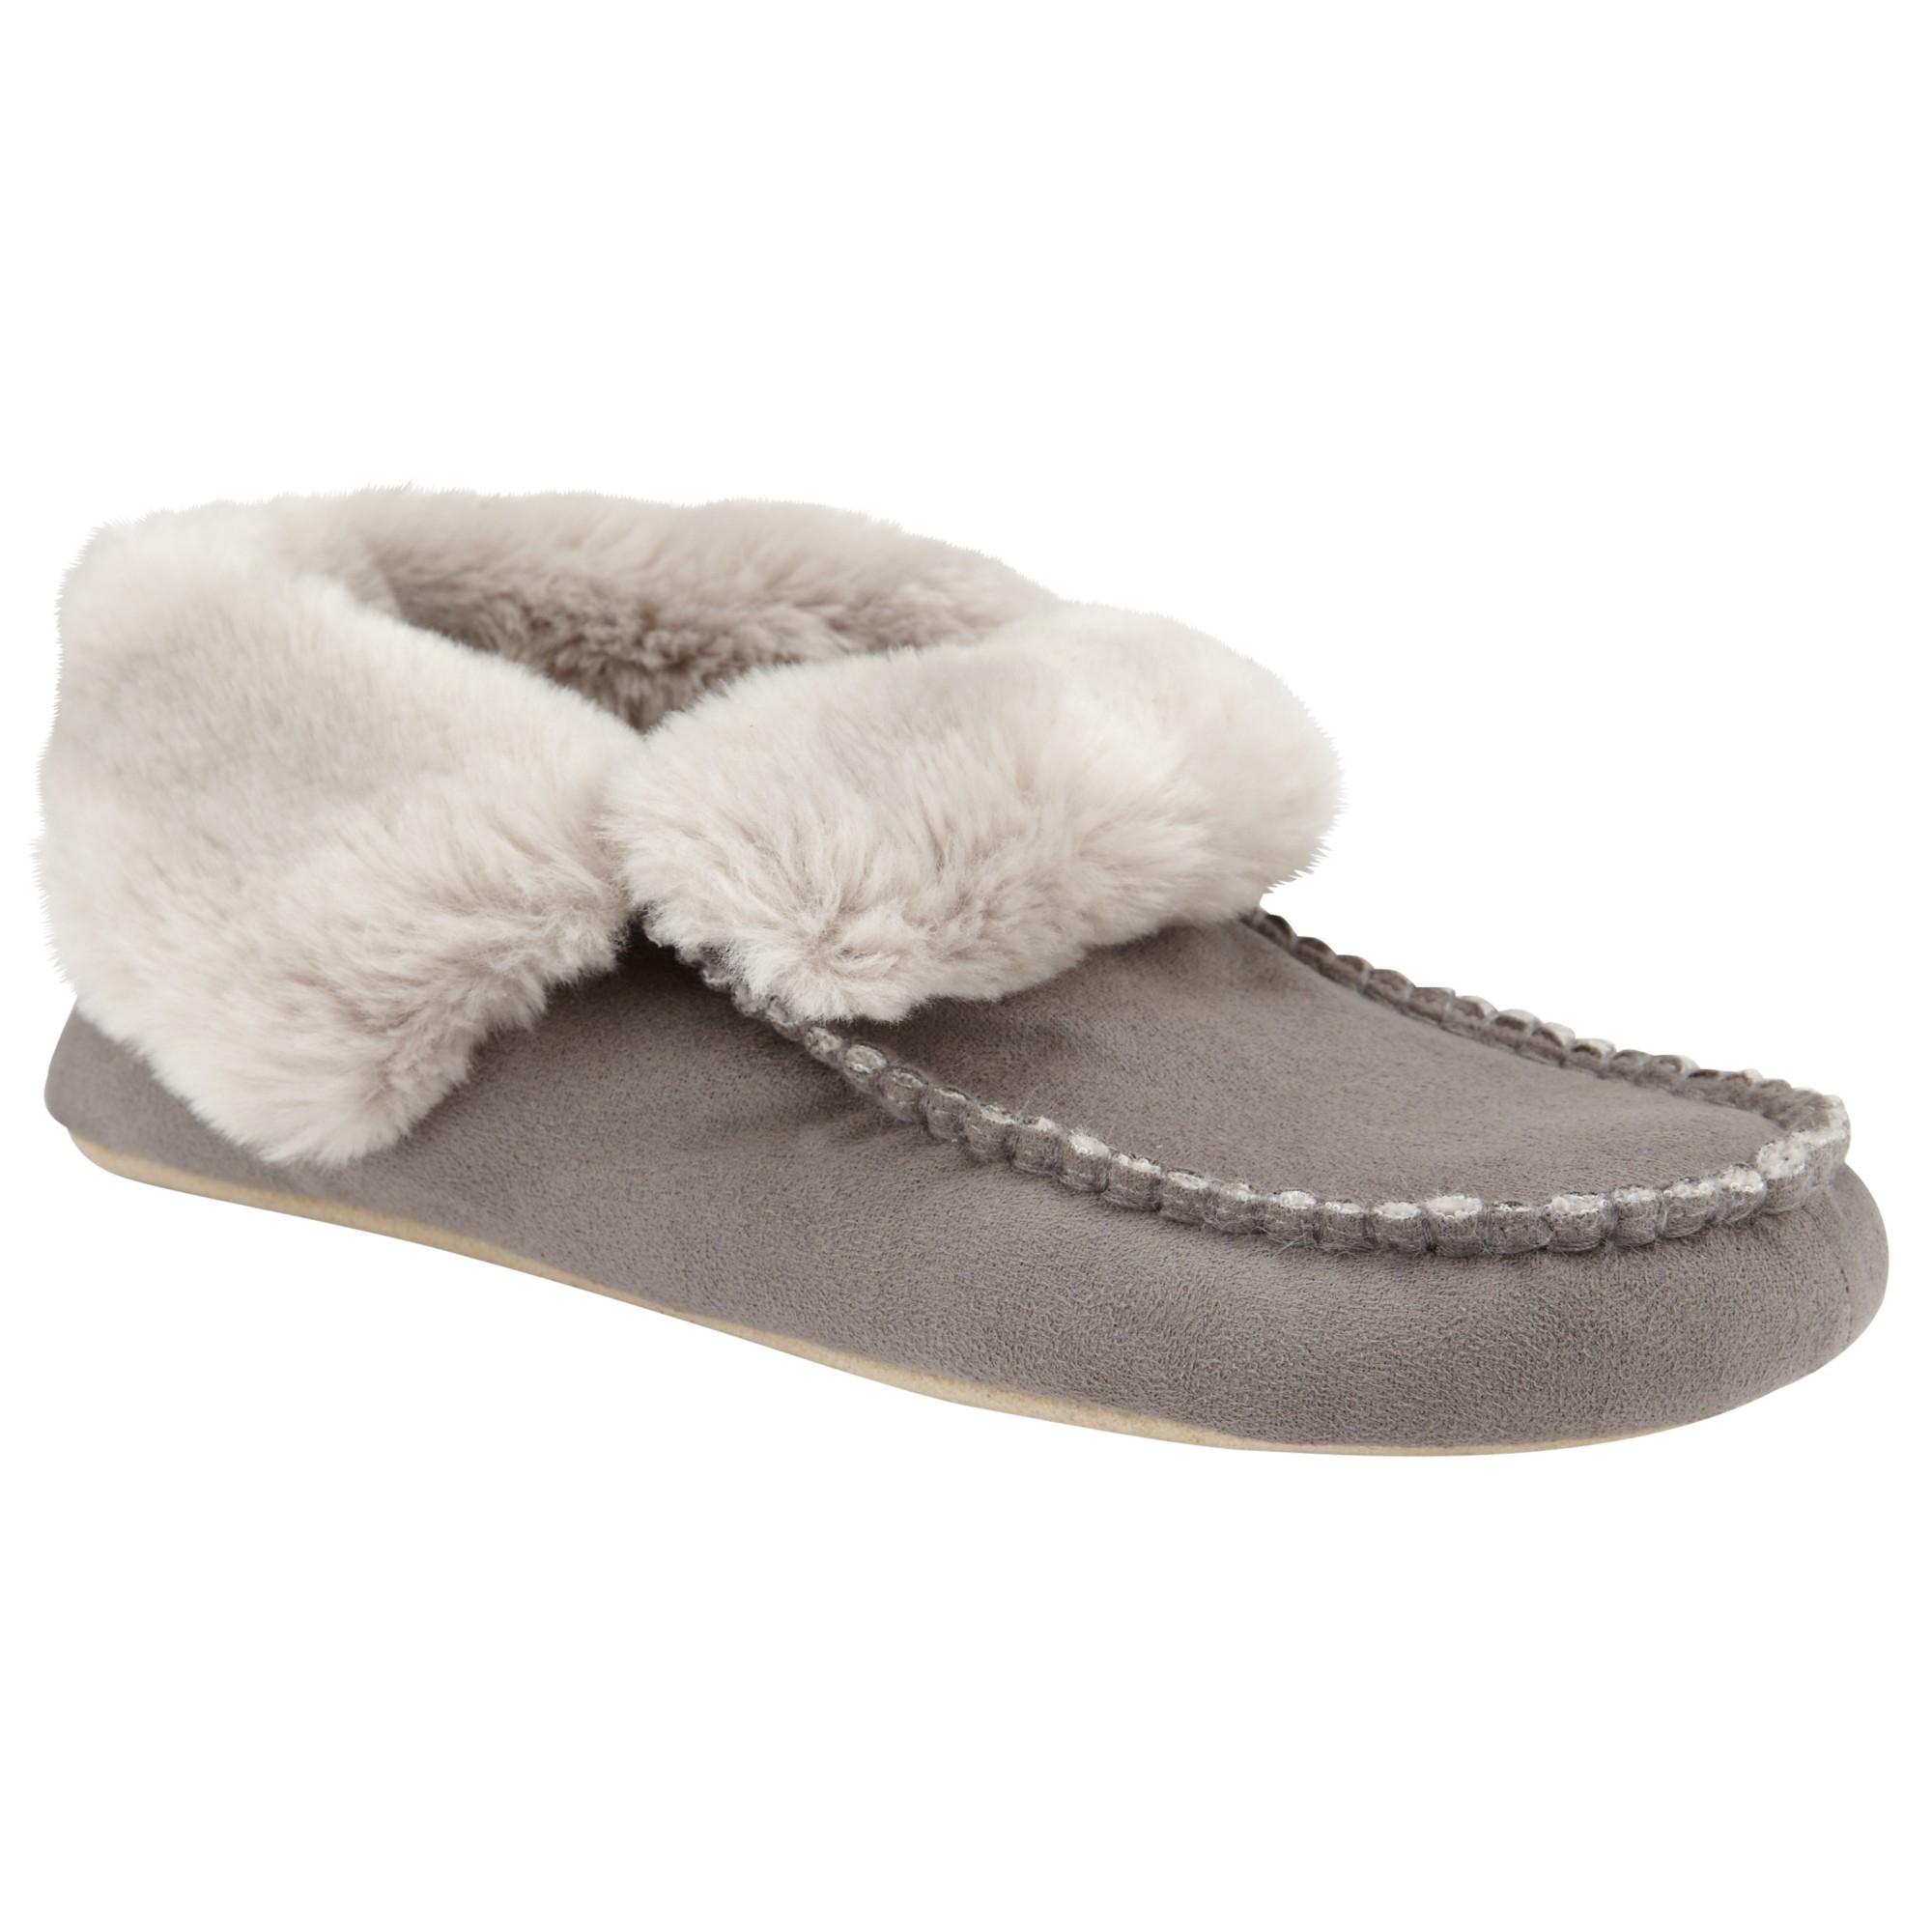 John Lewis Mimi Moc Bootie Slippers in Grey (Grey)